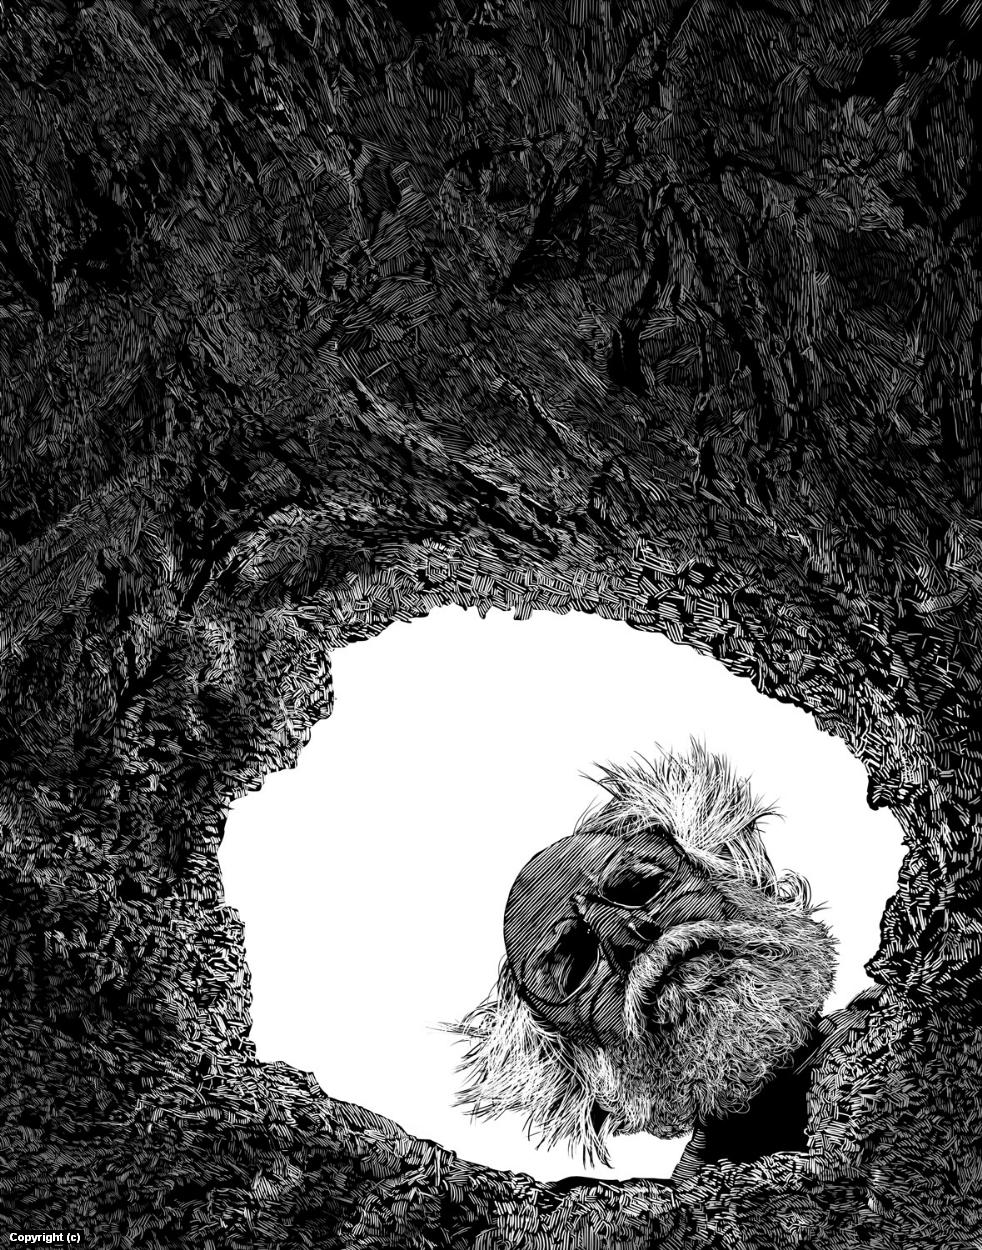 Mel's Hole Artwork by Douglas Bell